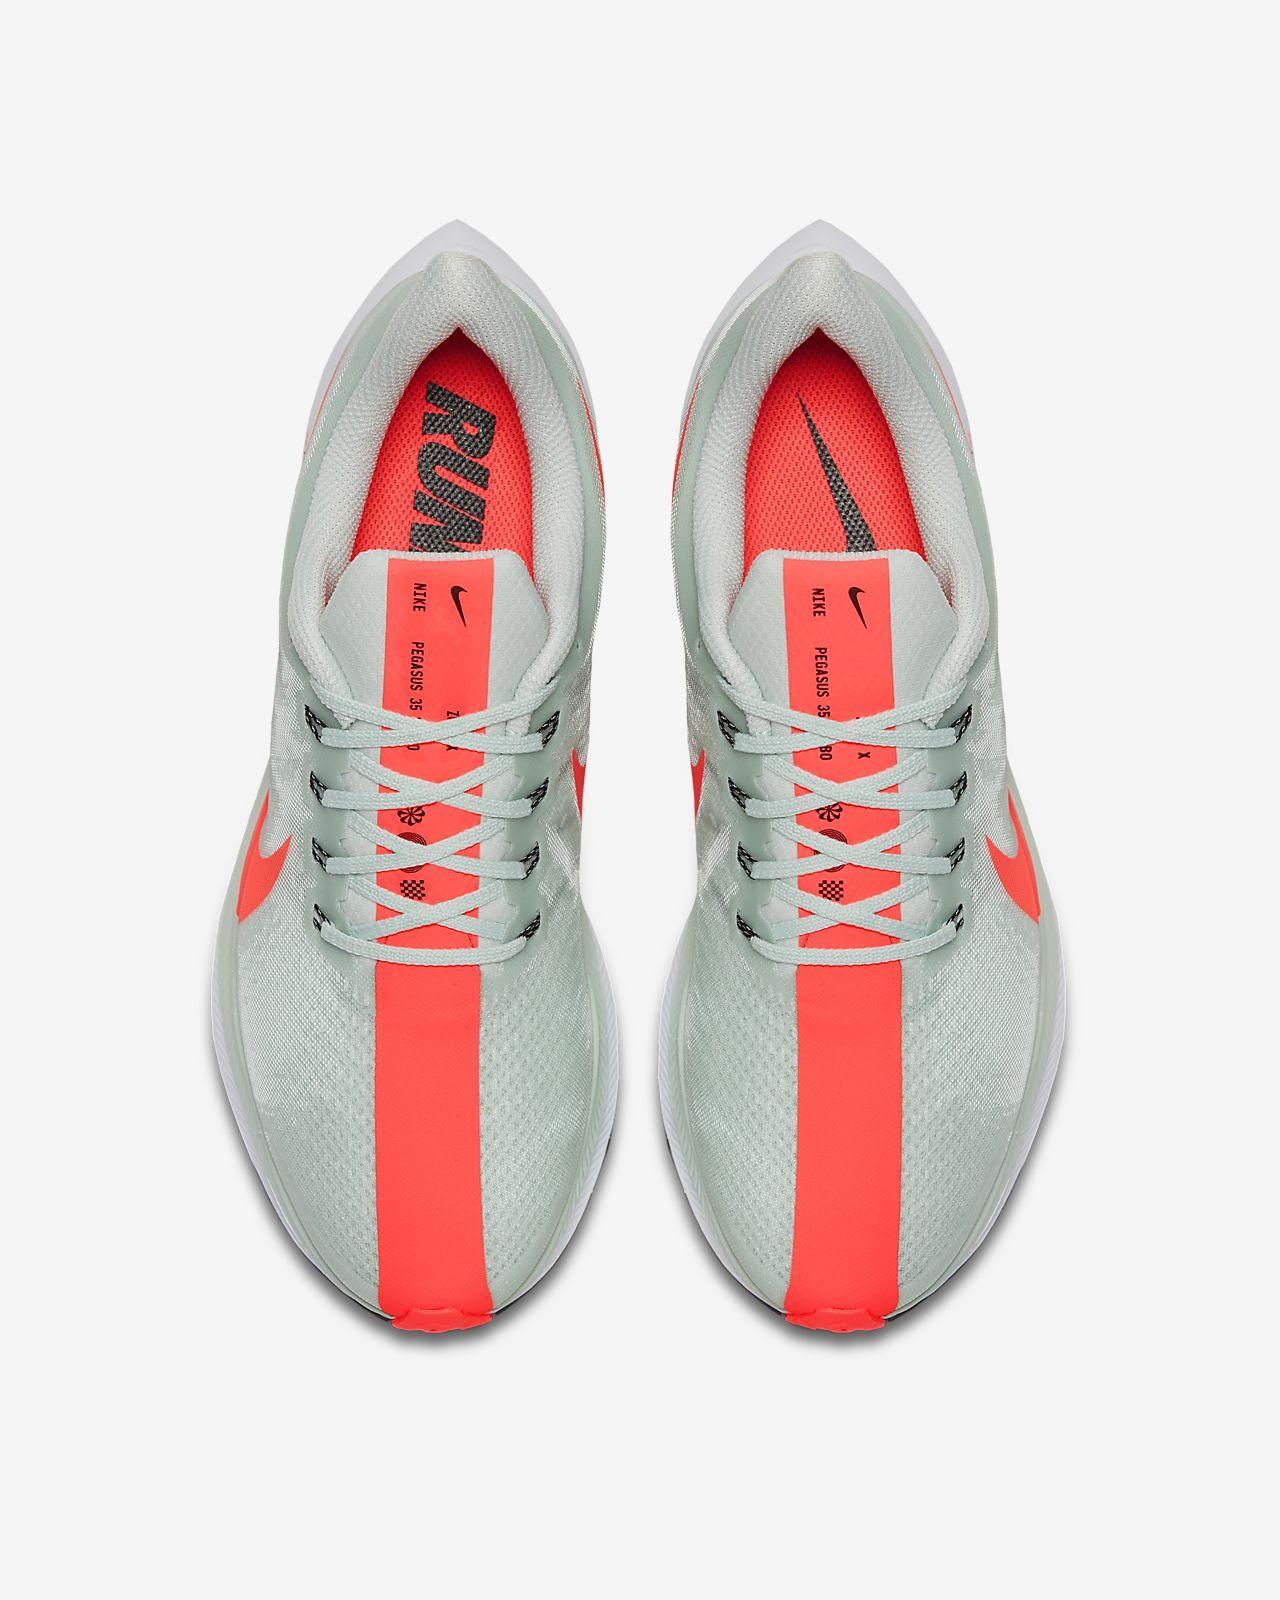 984576ca1d7 Sneaker design | Running | Nike | Zoom Pegasus Turbo | LIFESTYLE ...